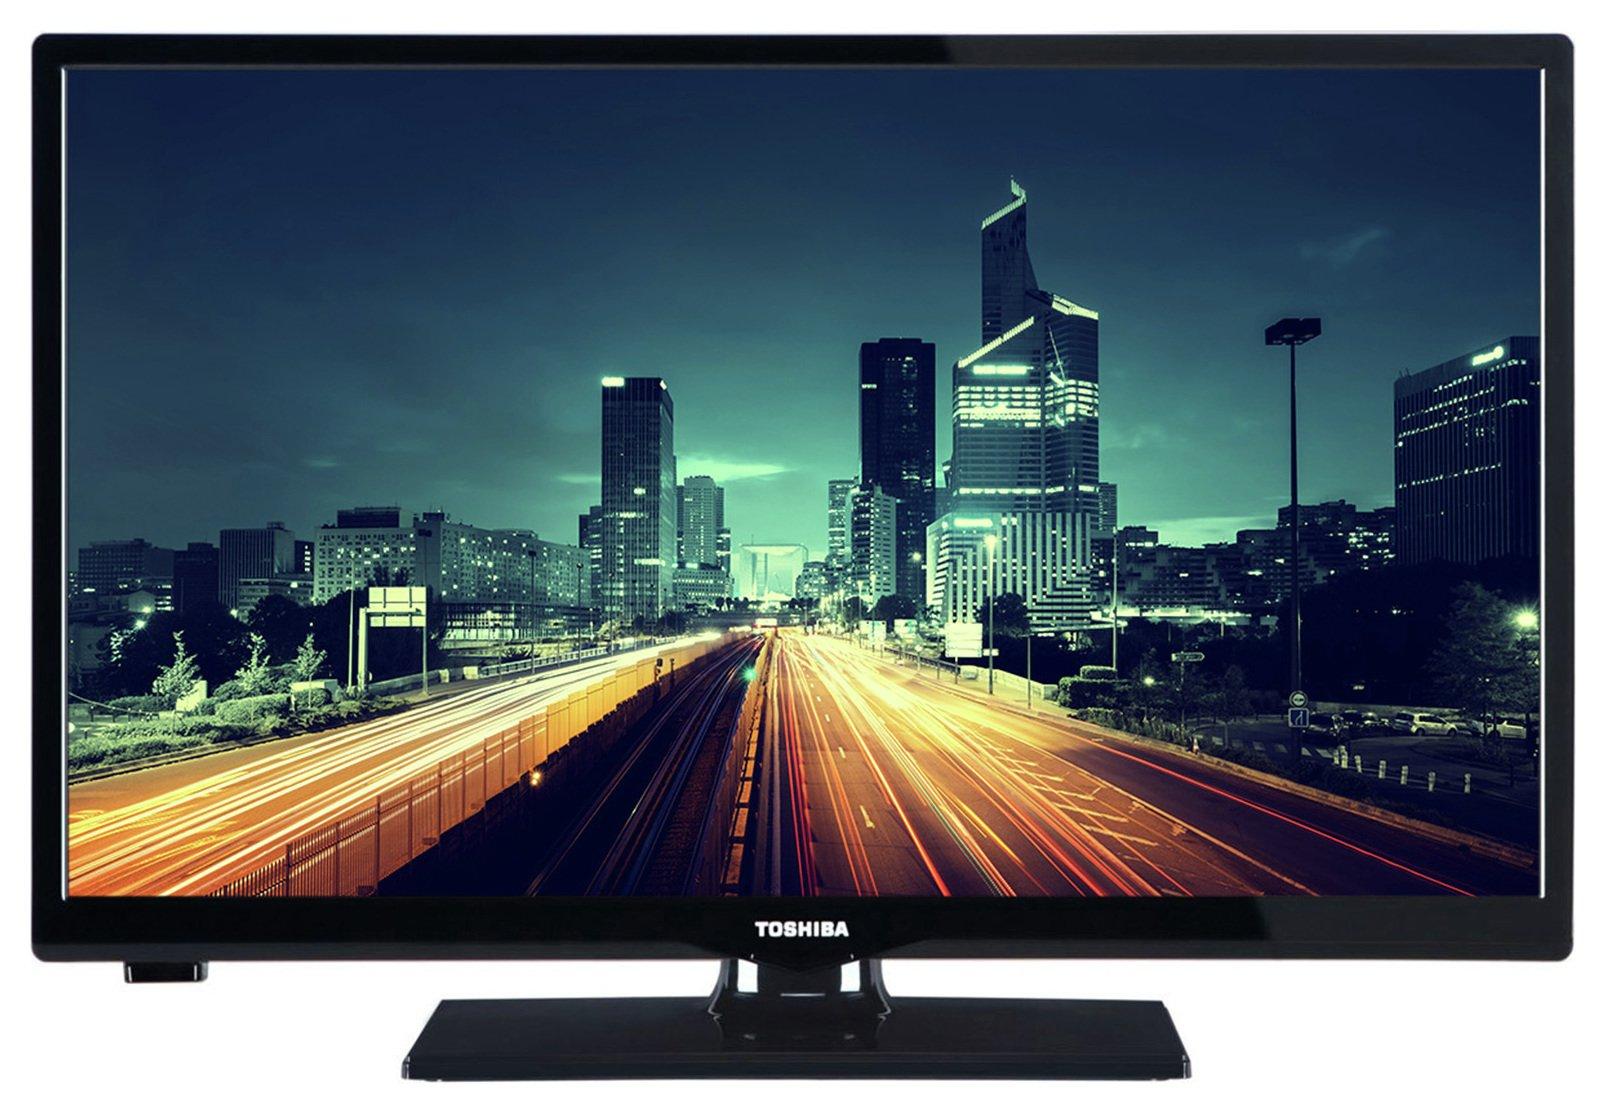 Toshiba Toshiba - 24 Inch - 24D1633DB - HD Ready LED TV/DVD Combi.